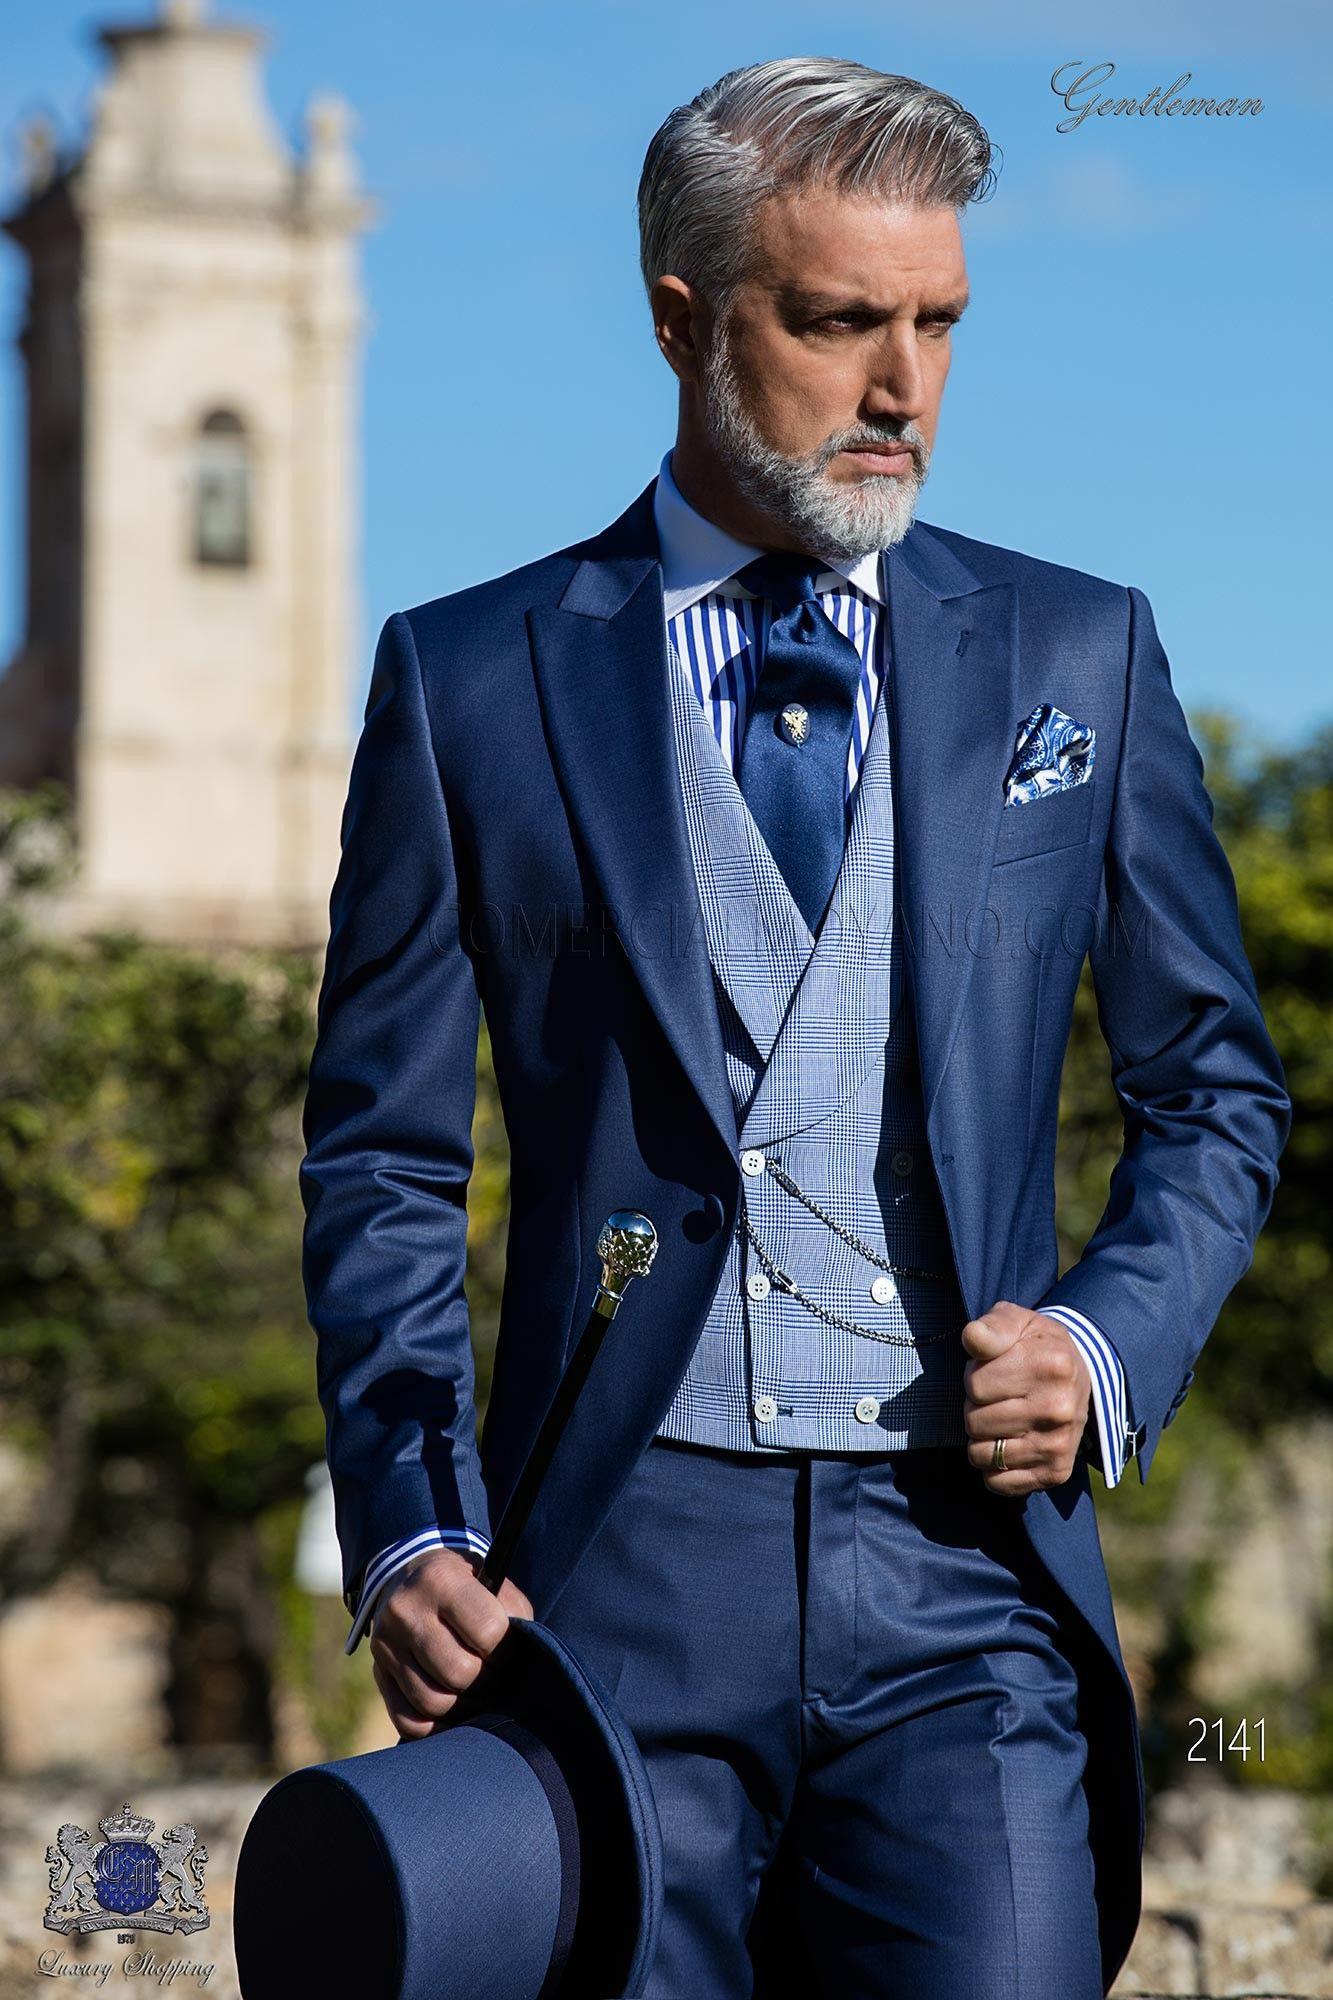 Mariage Wedding Jaquette Hommes 2019 En De Cool Royal Bleu Wool Rxq5azxOw